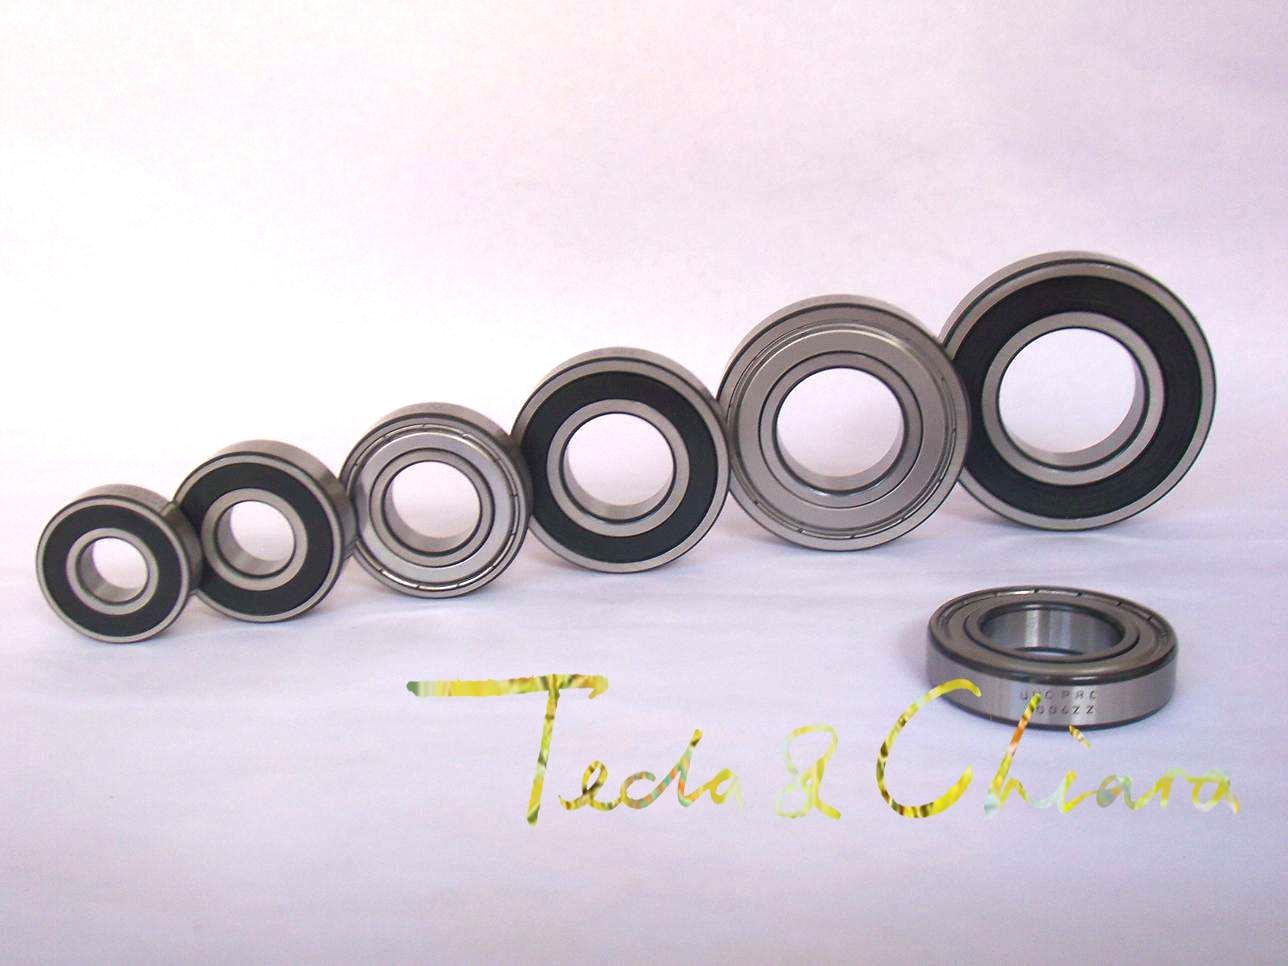 MR137 MR137ZZ MR137RS MR137-2Z MR137Z MR137-2RS ZZ RS RZ 2RZ L-1370ZZ Deep Groove Ball Bearings 7 x 13 x 4mm High Quality 1pcs double shielded miniature deep groove ball bearings mr137zz 7 13 4 mm